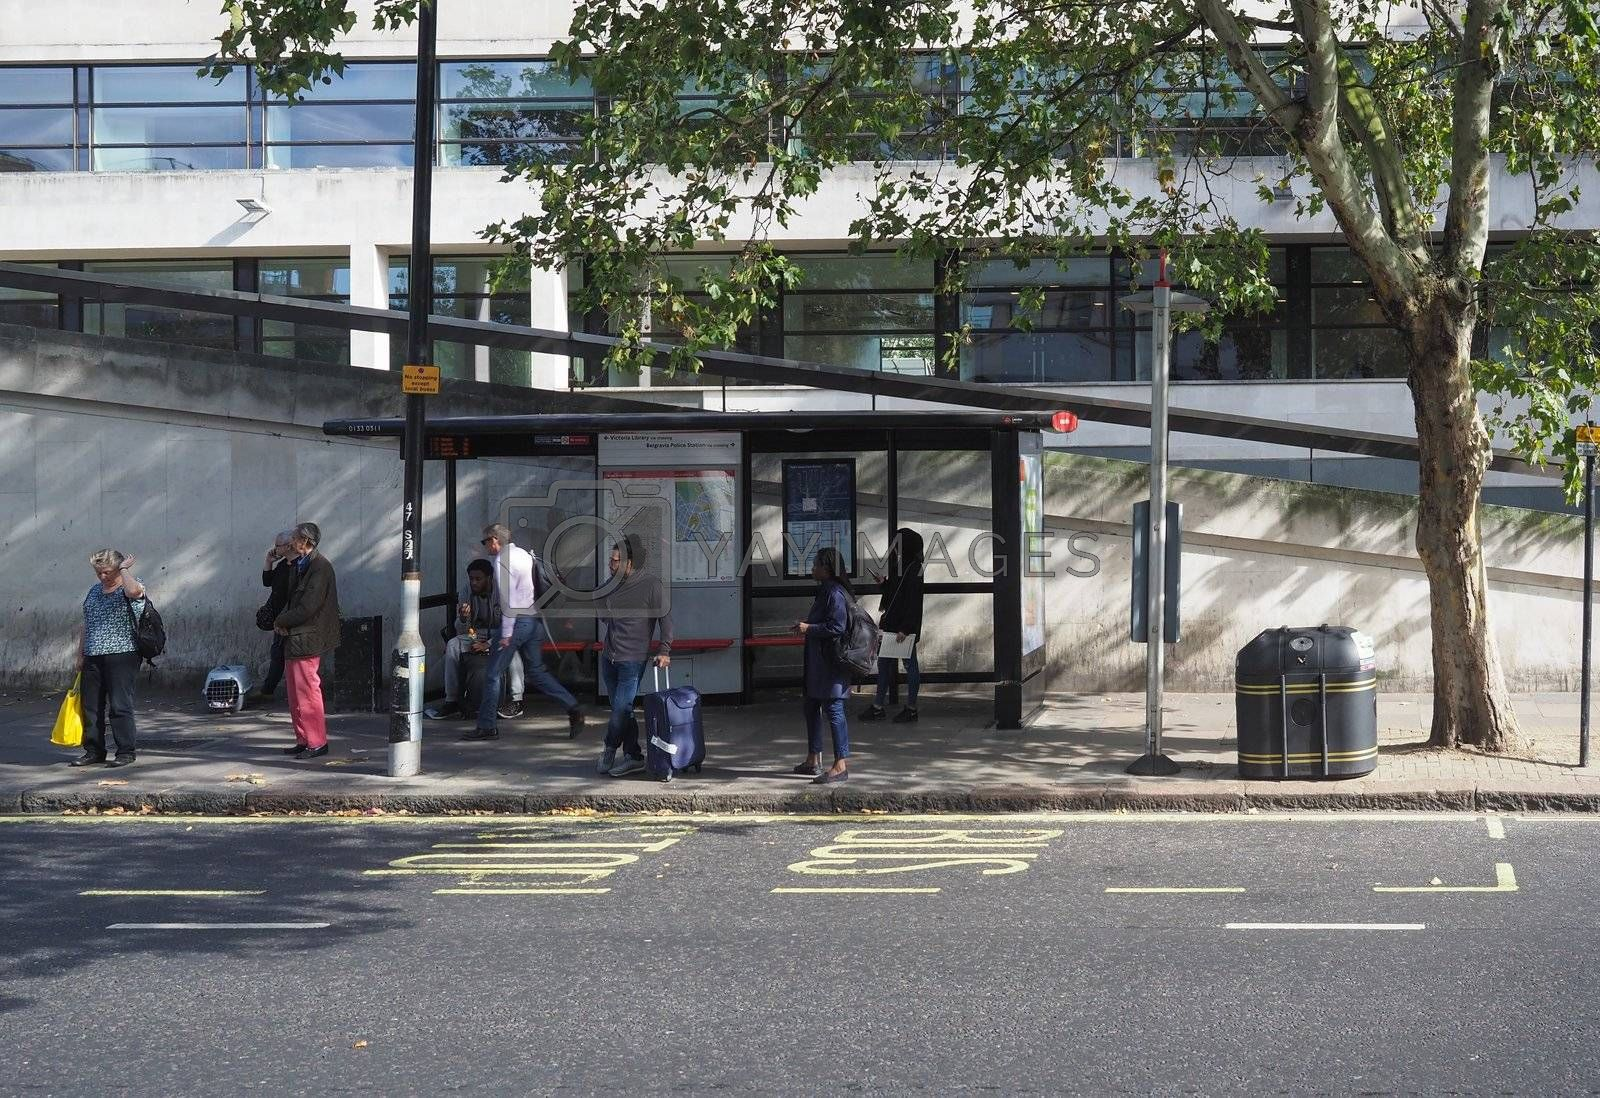 LONDON, UK - CIRCA SEPTEMBER 2019: Public transport bus stop